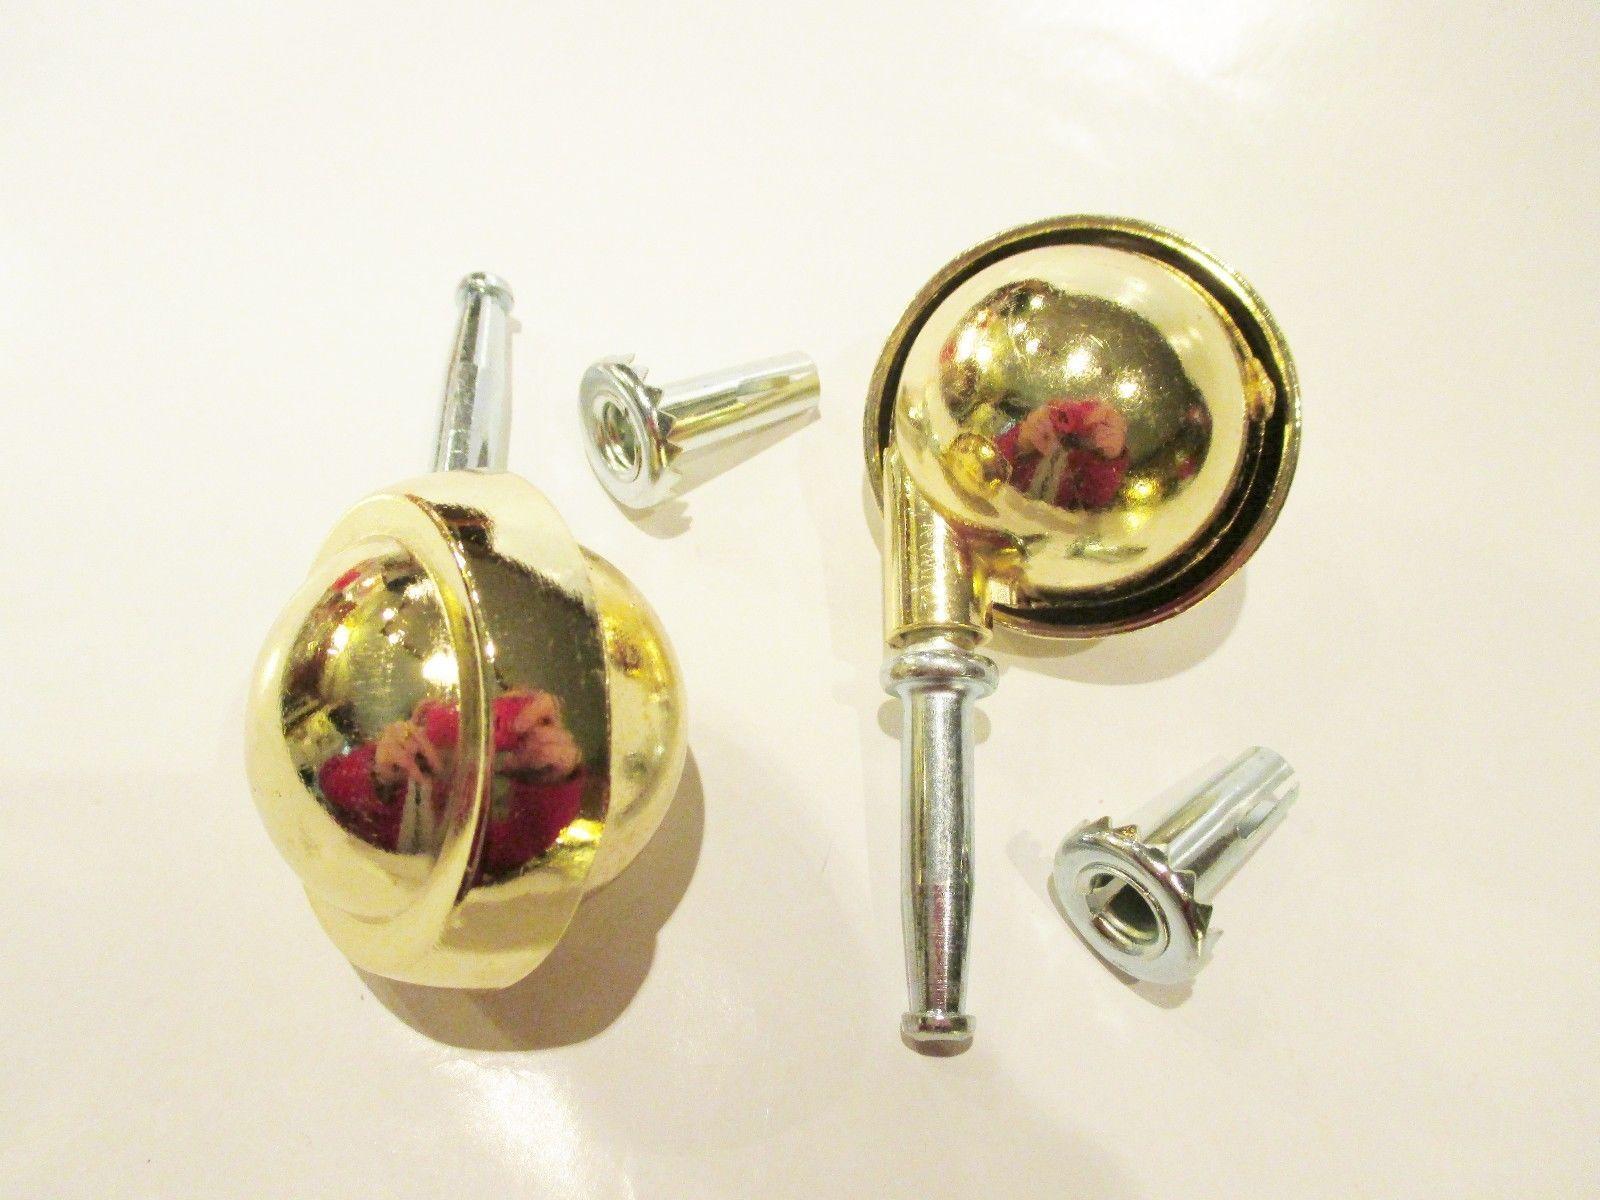 "Round Gold Metal Ball Caster 2 Pack 2"" Faultless Swivel Wheel"